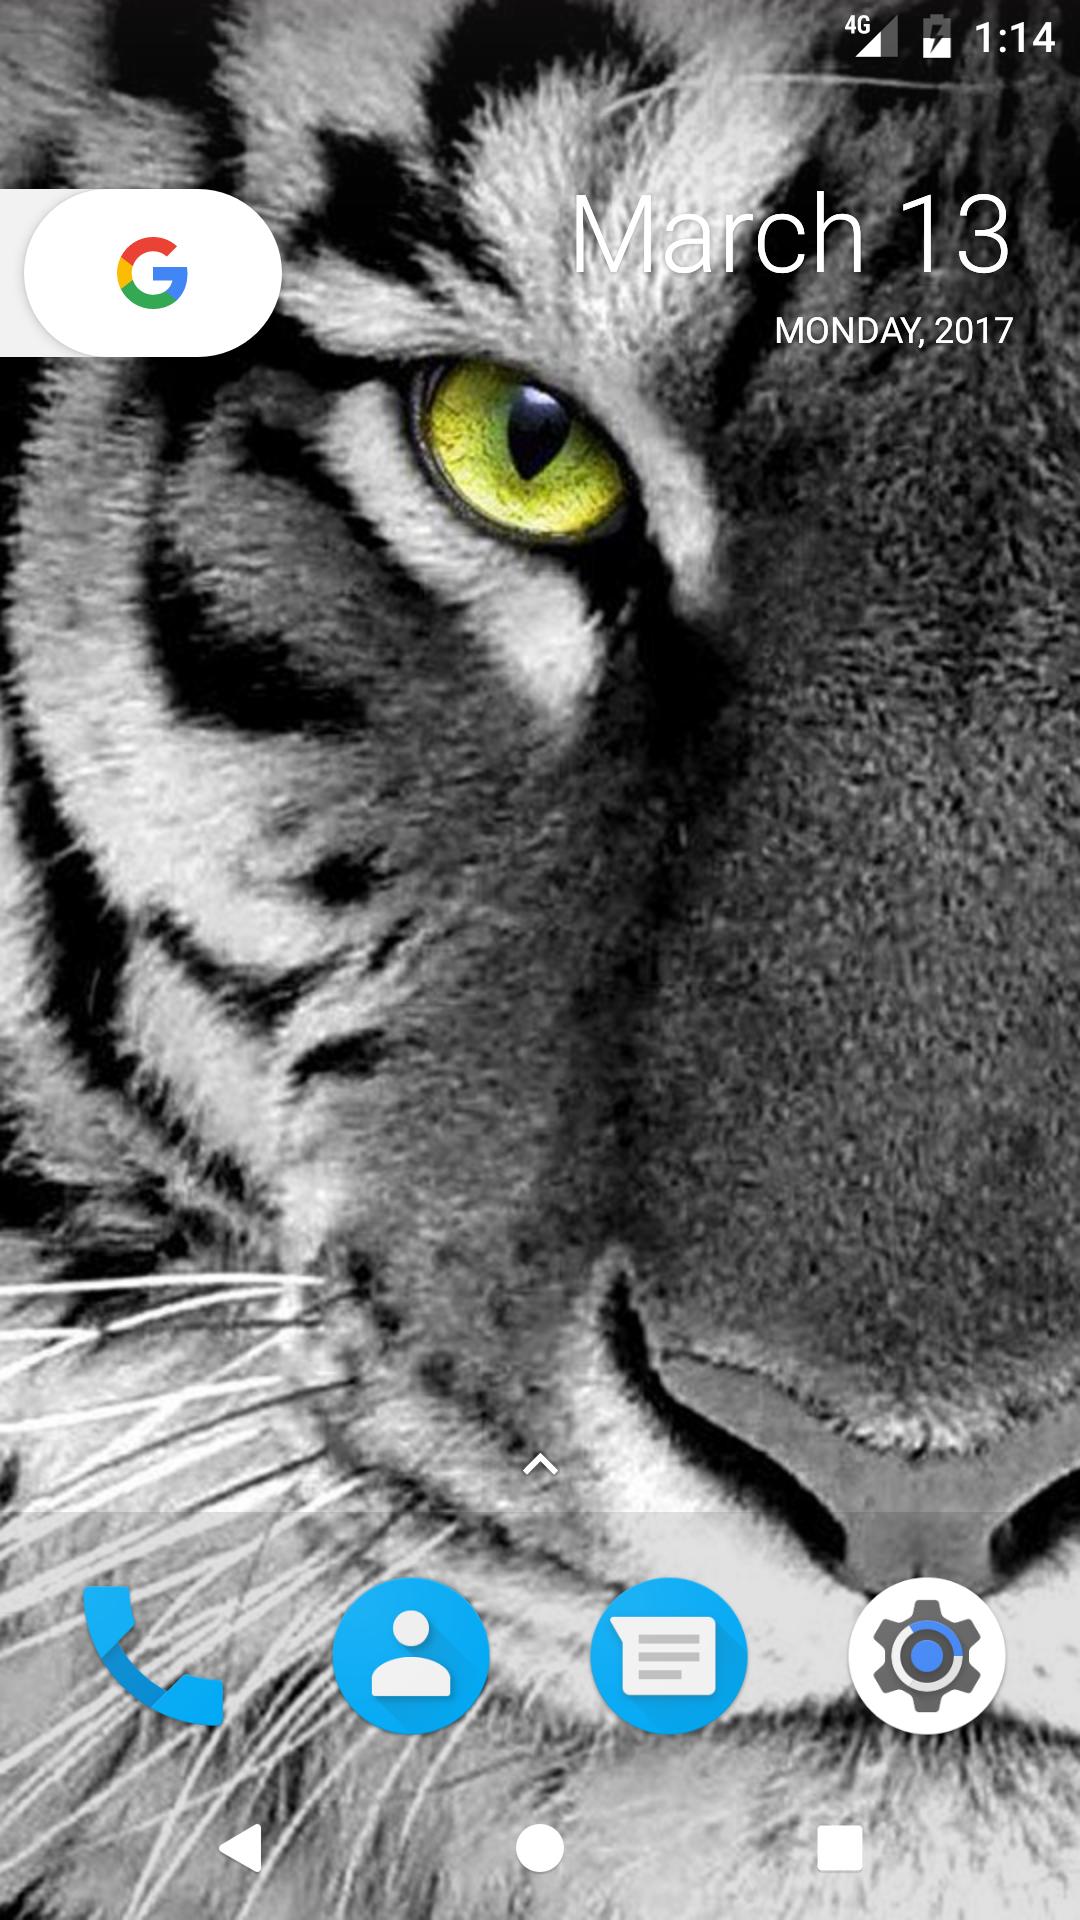 Unduh 4000+ Wallpaper Hd Android Tiger  Terbaik